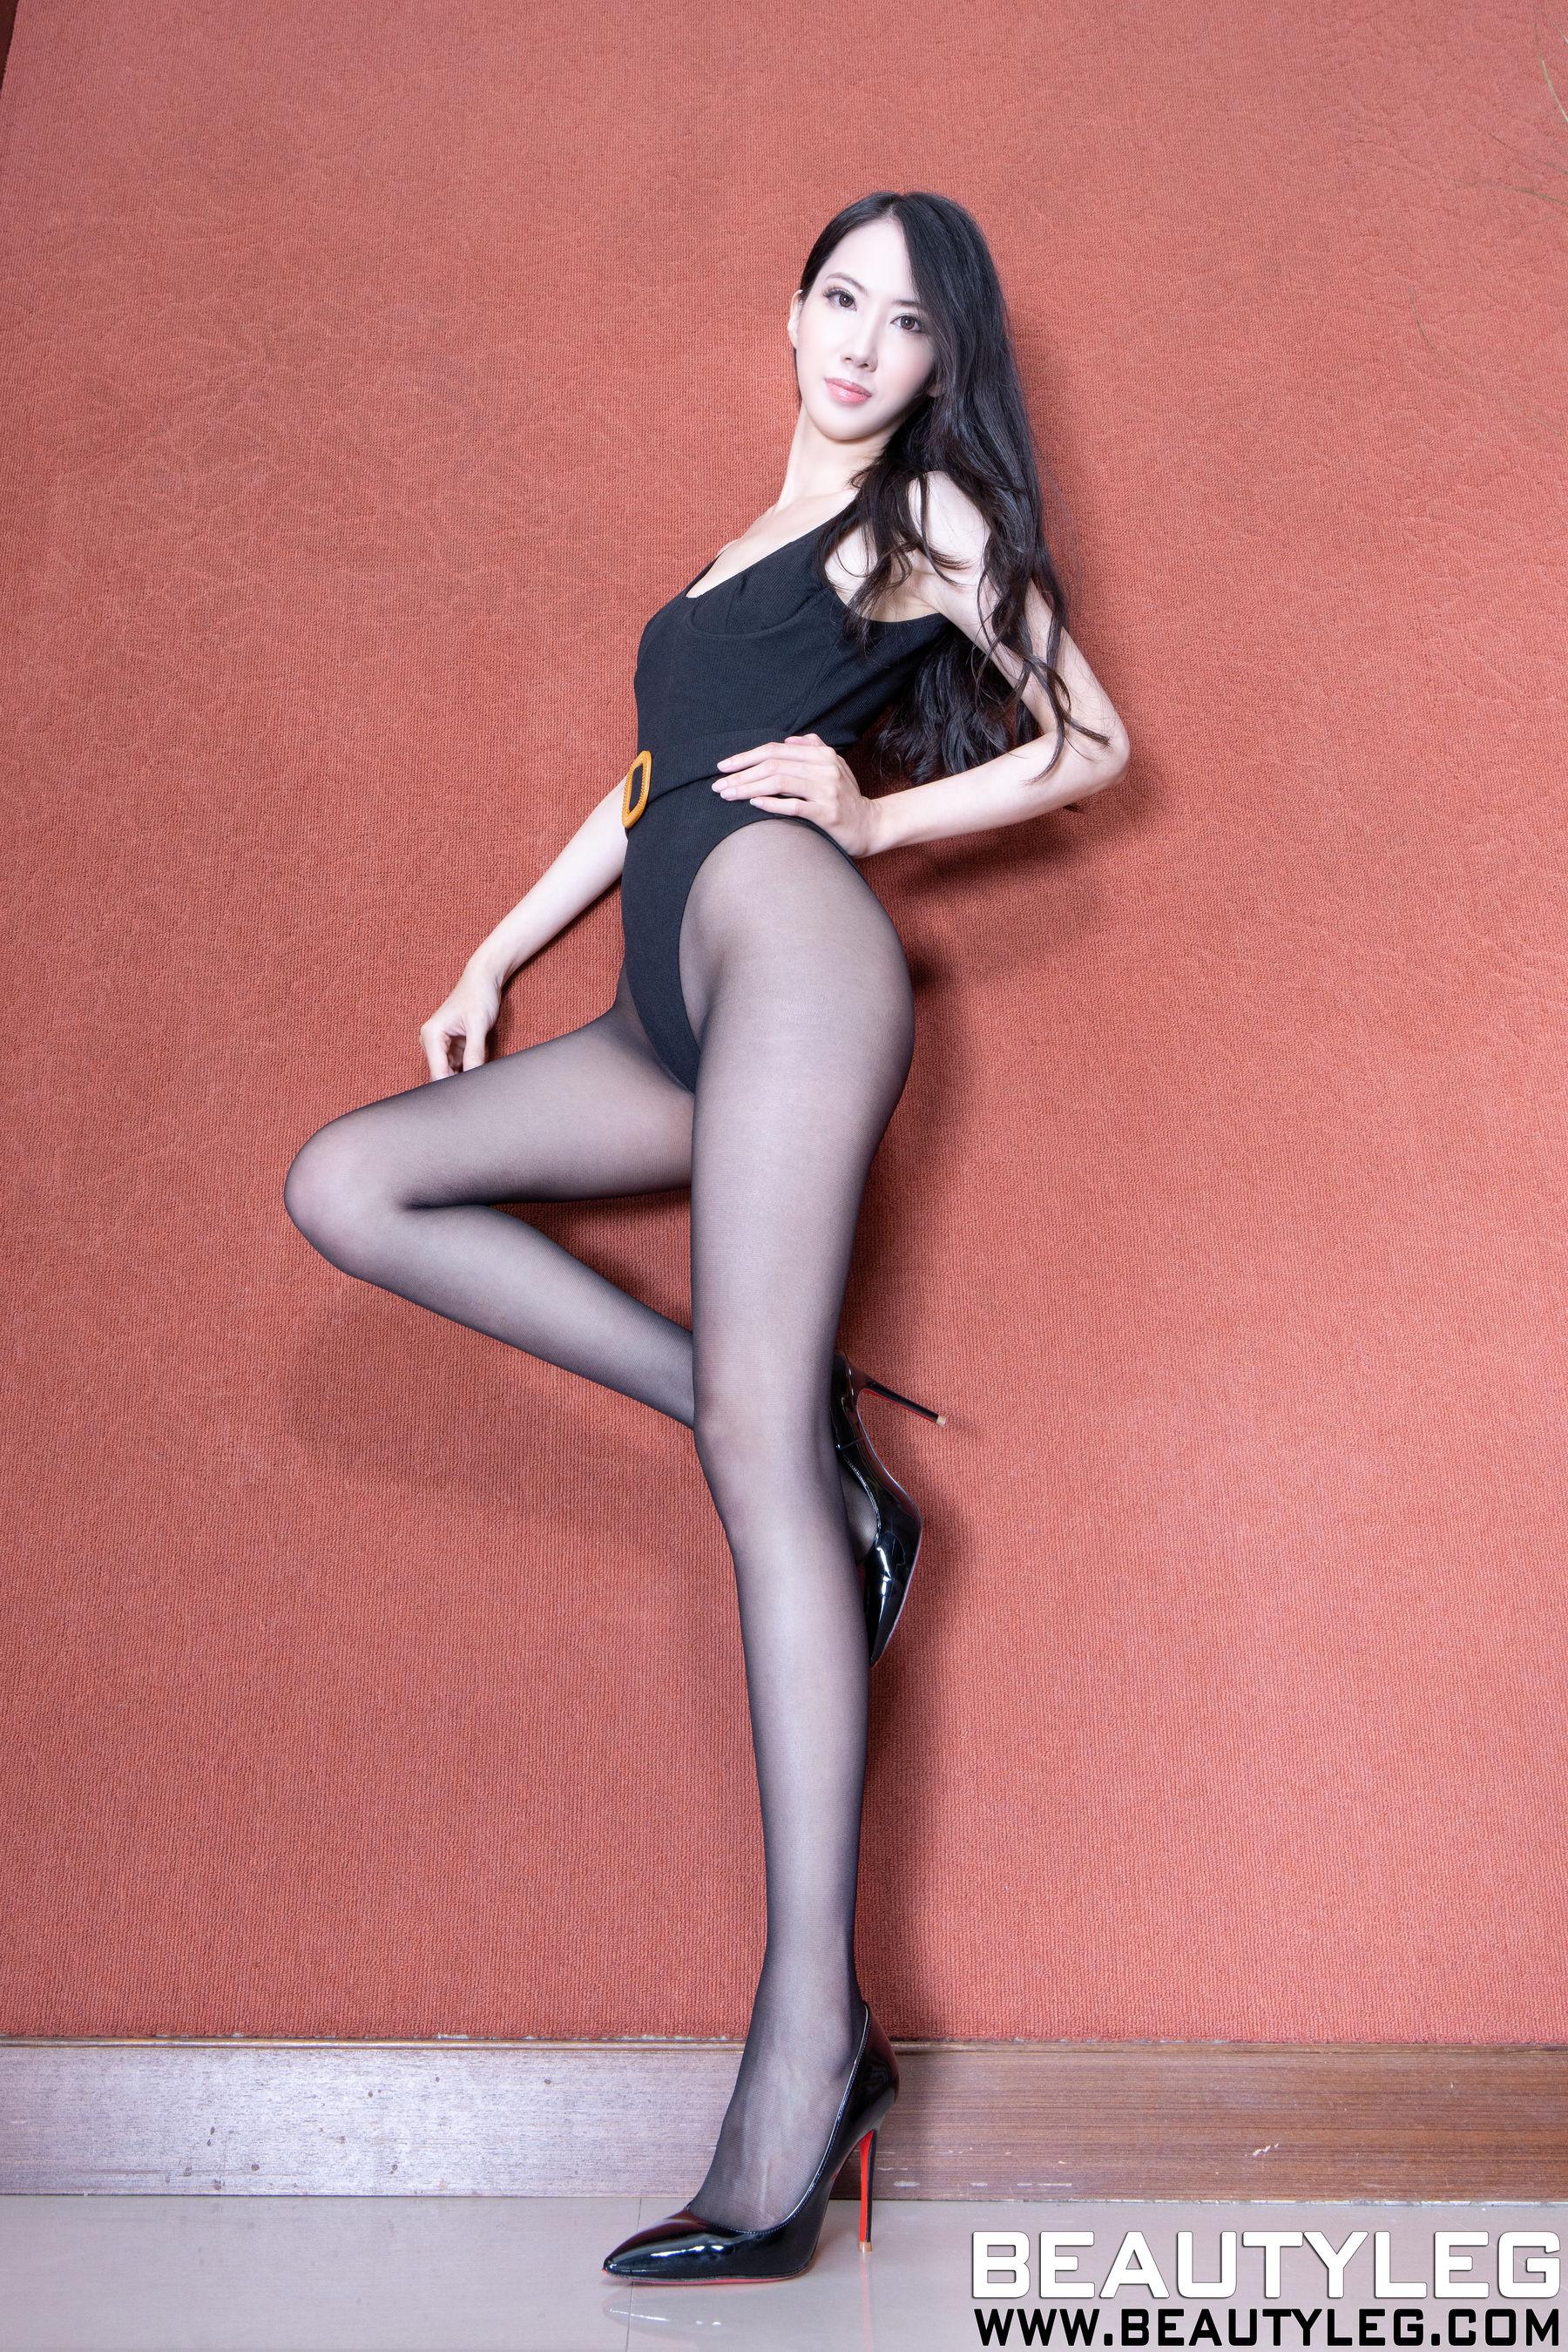 VOL.1870 [Beautyleg]黑丝美腿:童采萱(Beautyleg Yoyo,腿模Yoyo)超高清个人性感漂亮大图(23P)